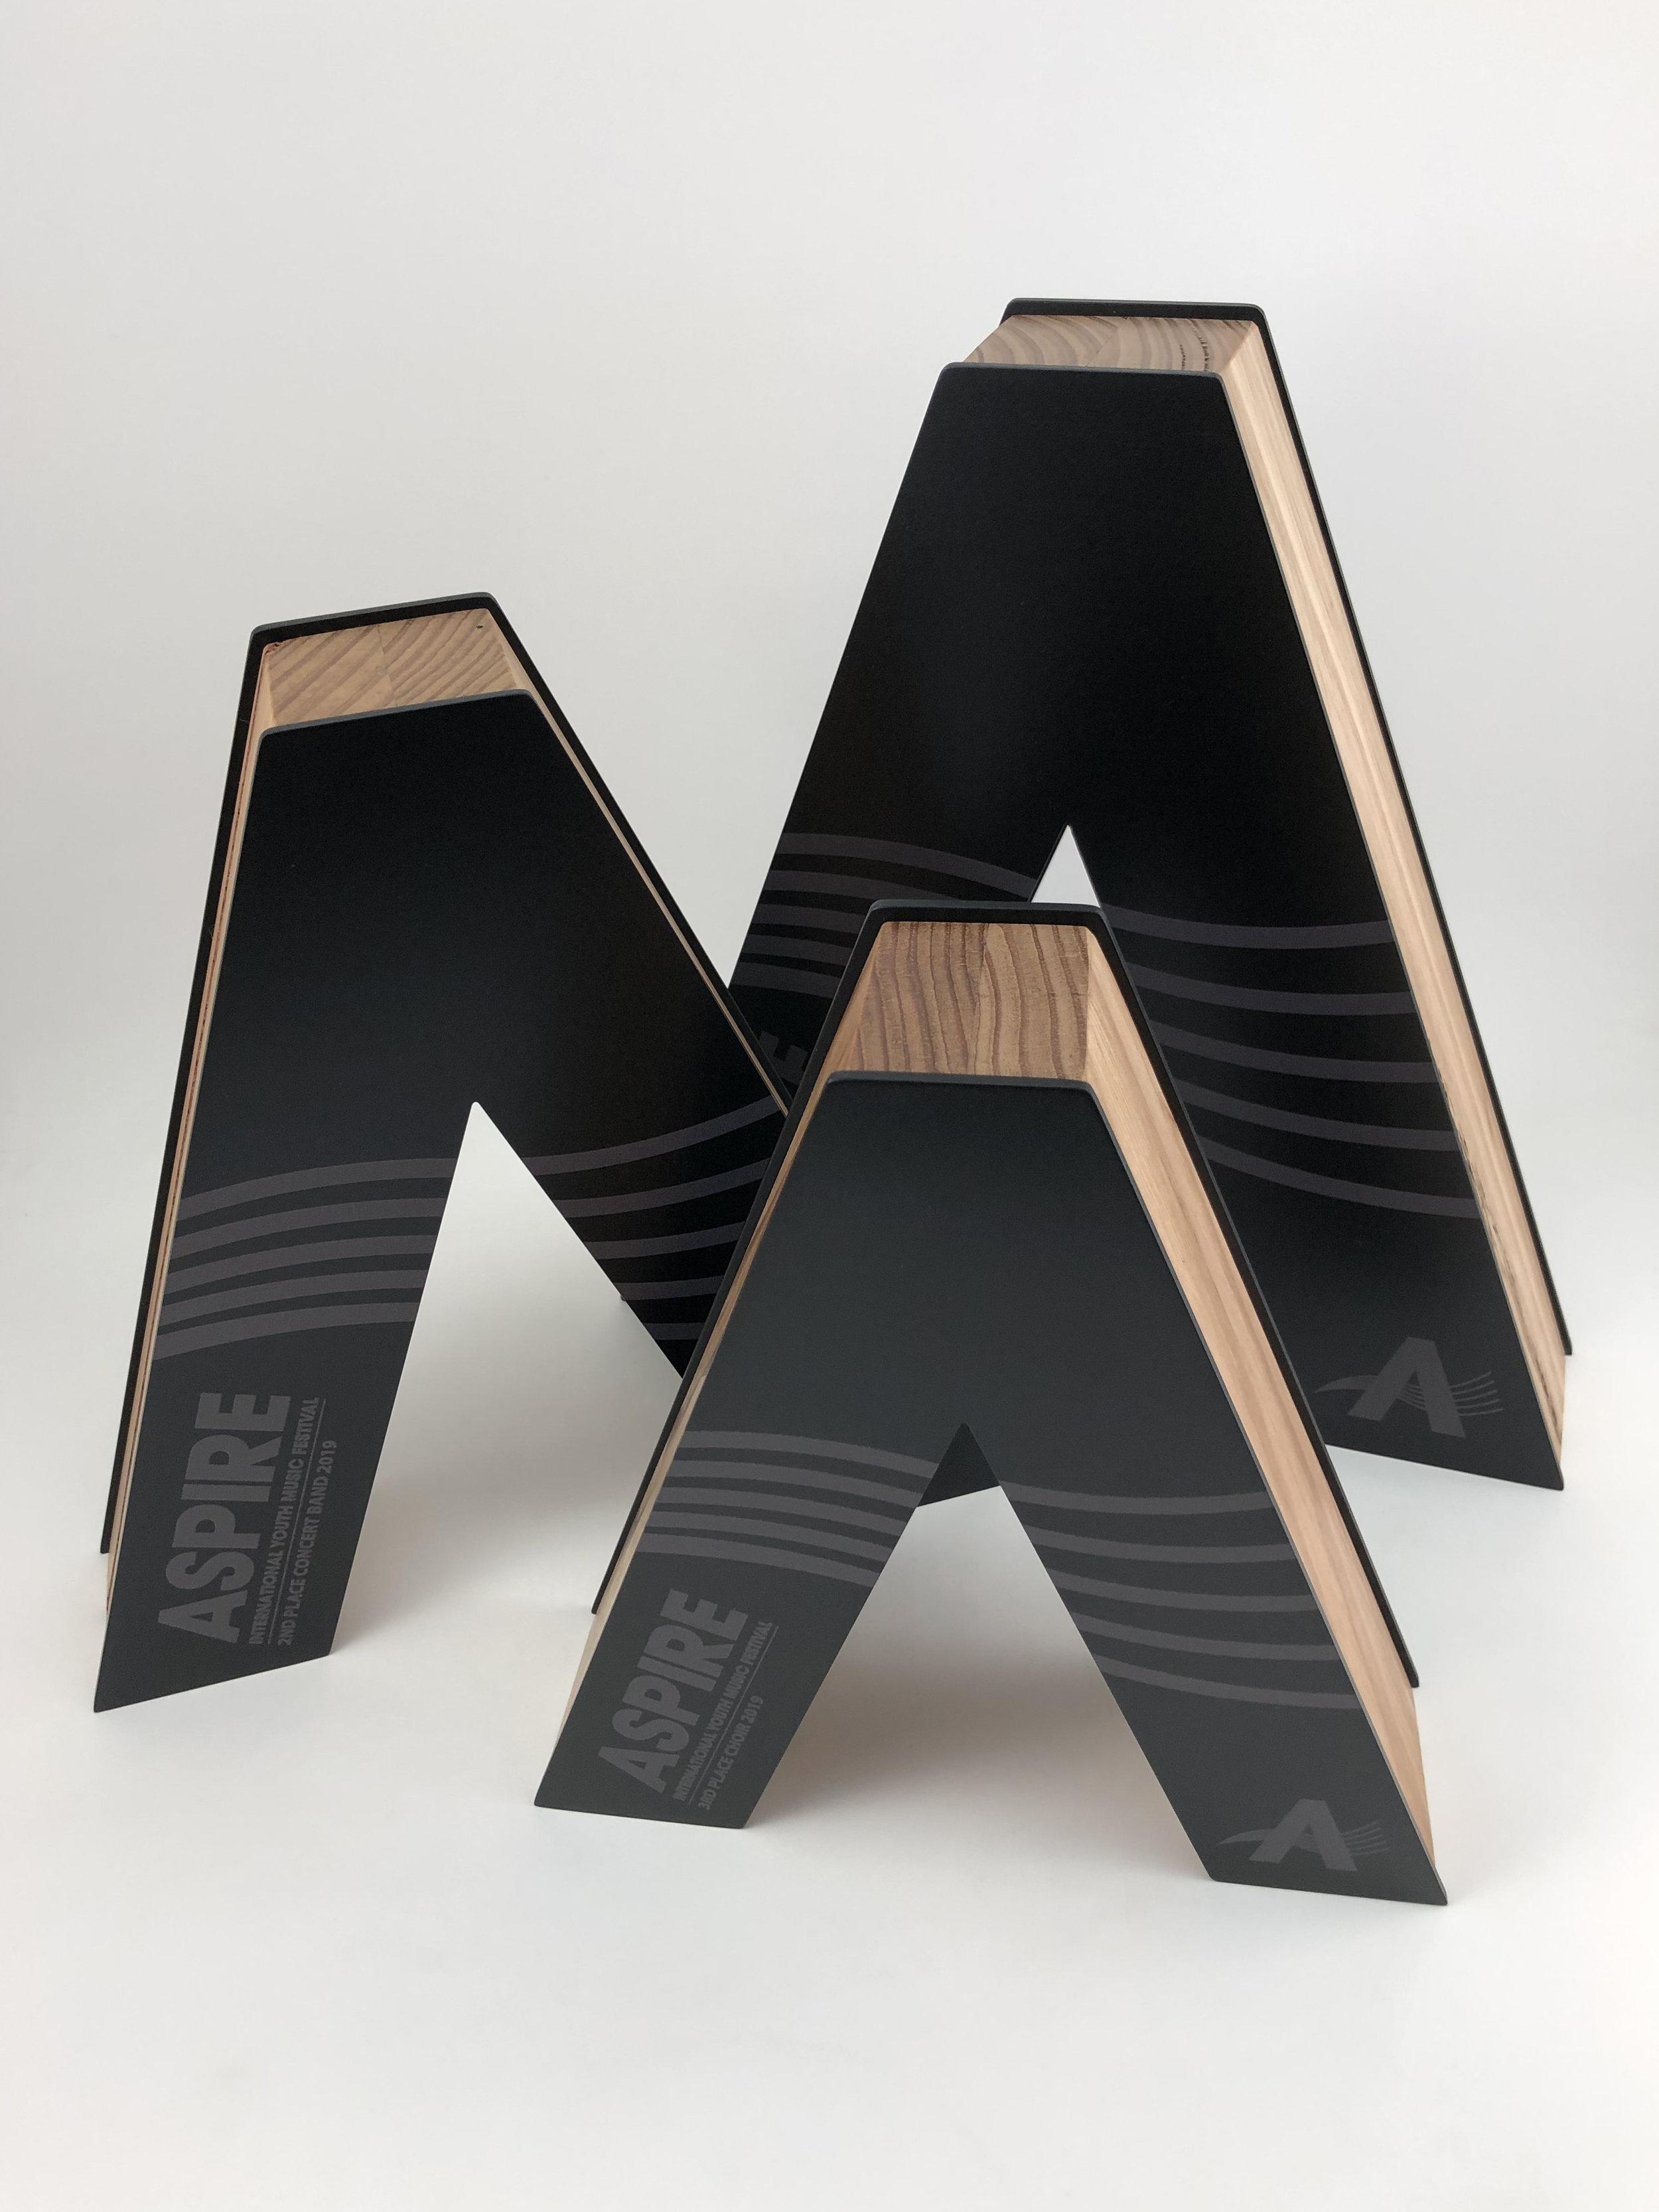 aspire-international-youth-music-festival-timber-metal-eco-trophy-awards-04.jpg